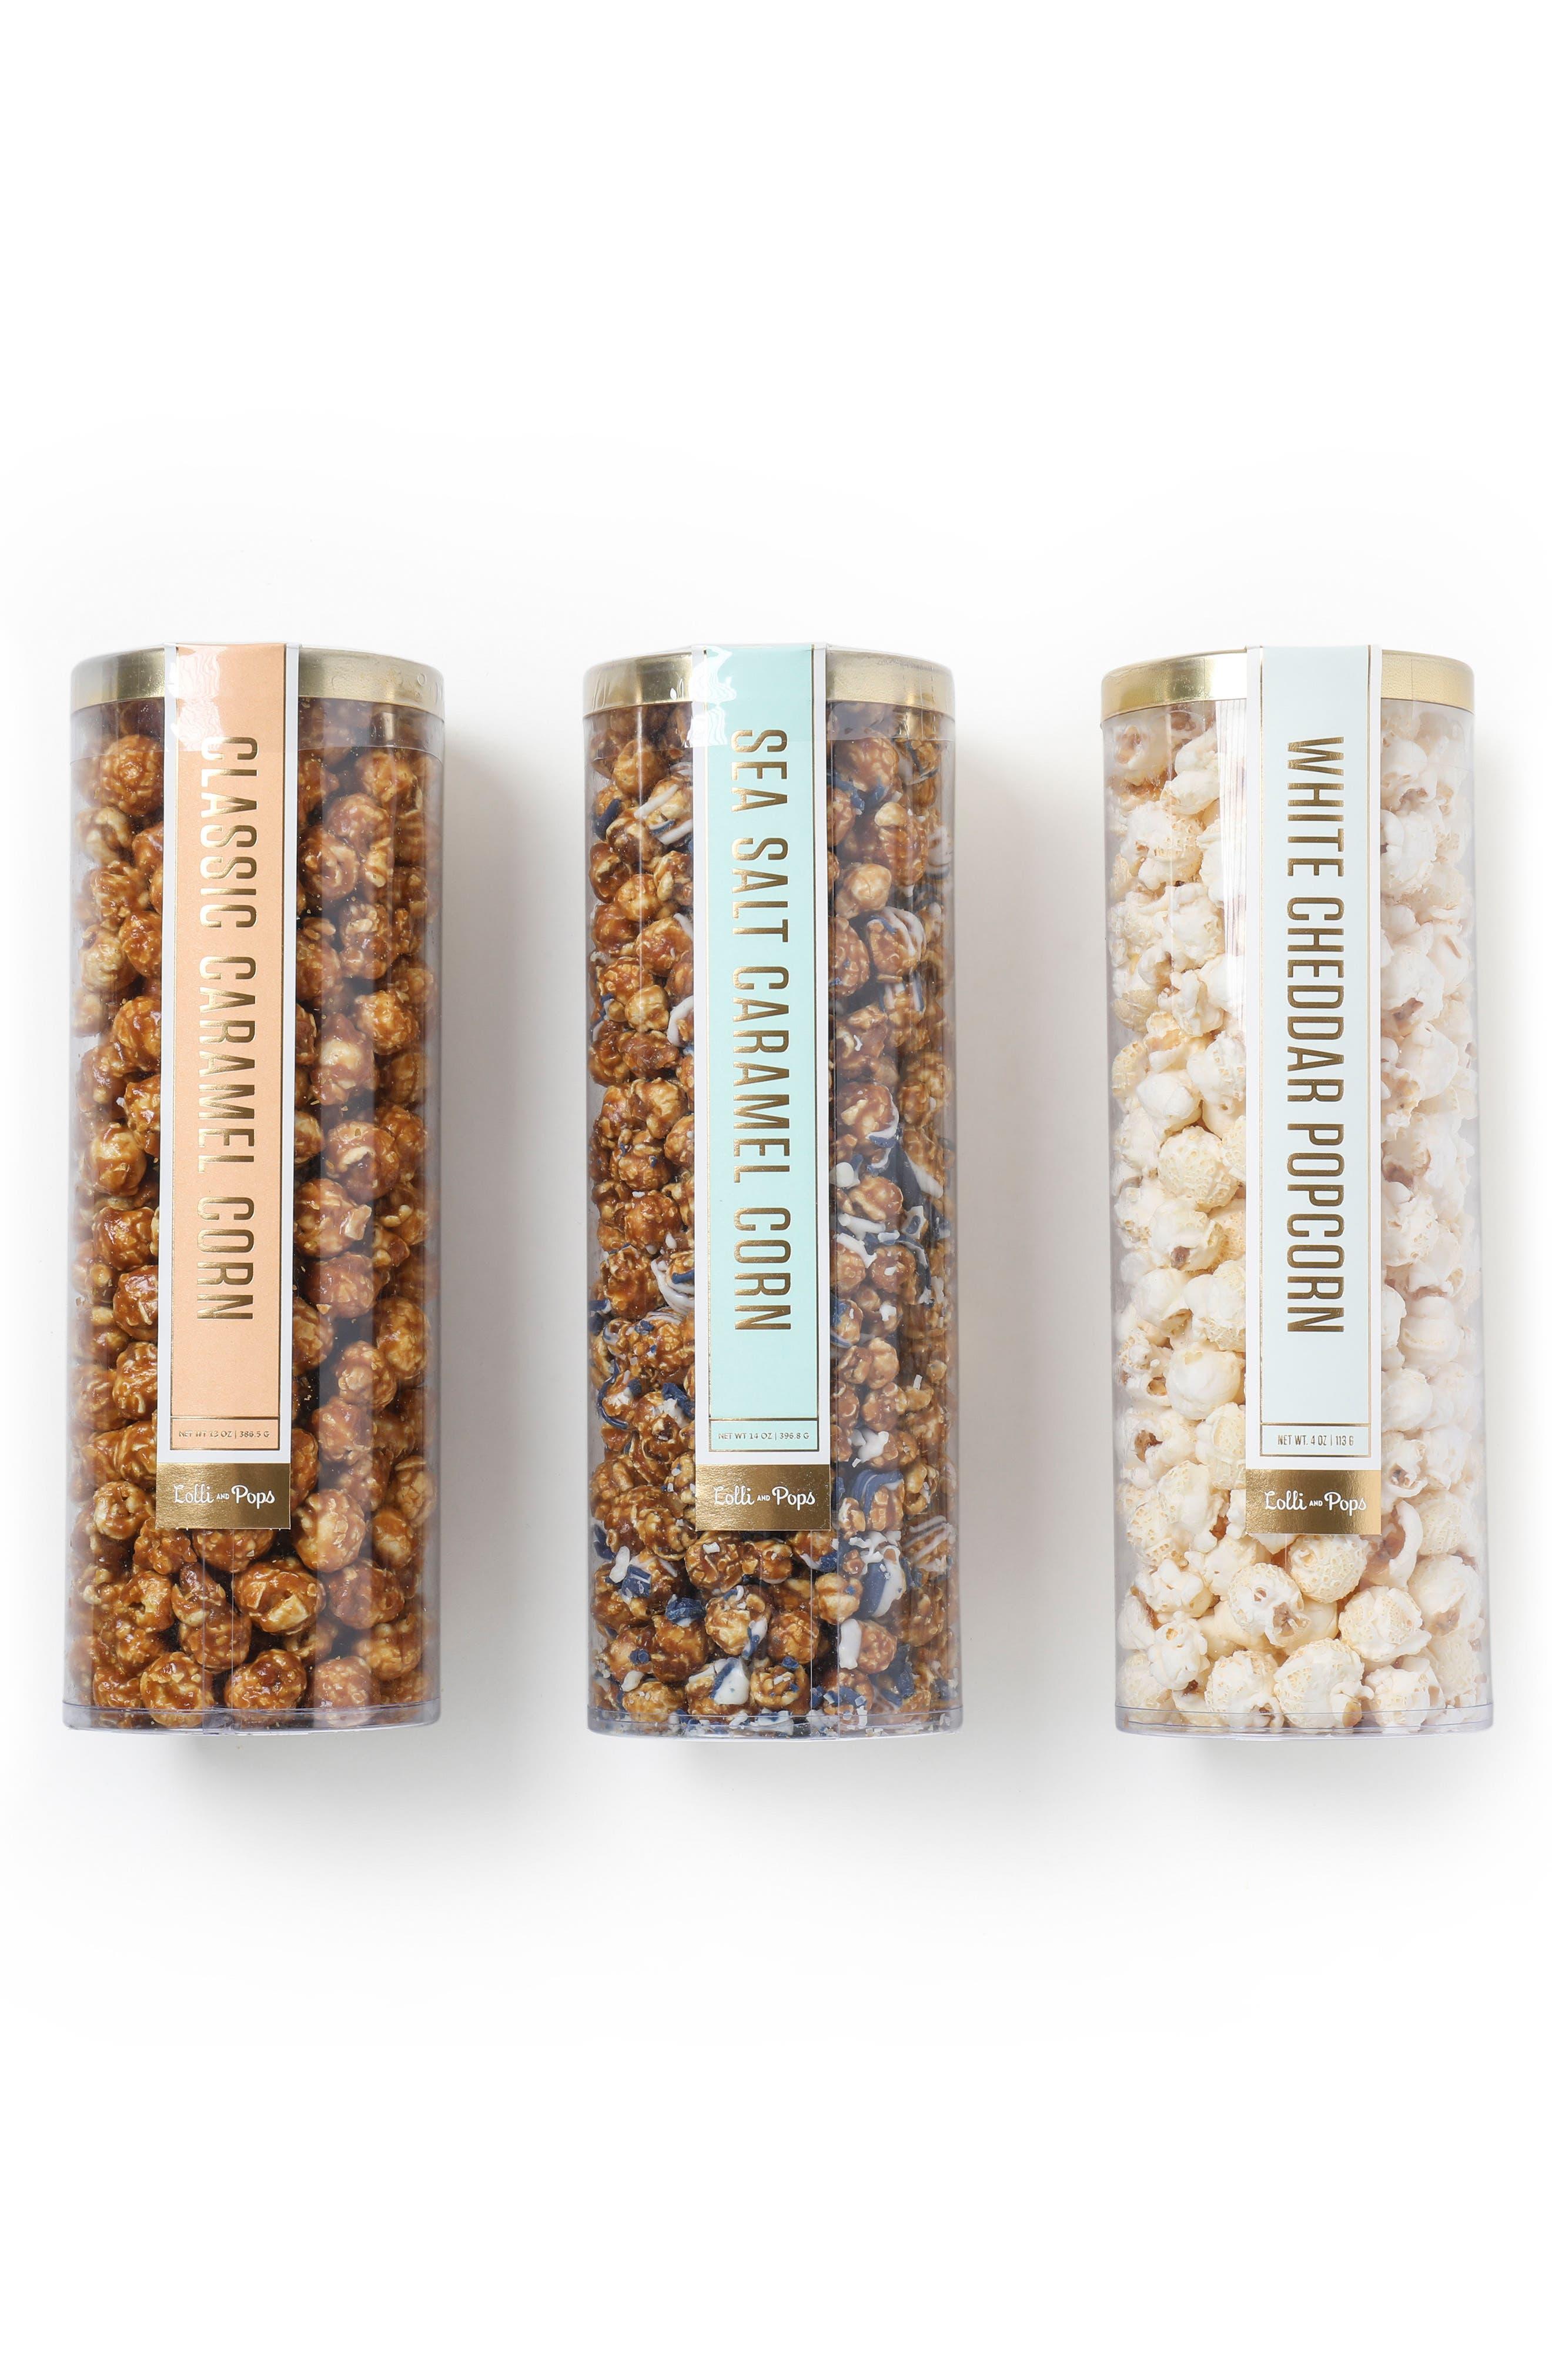 Alternate Image 1 Selected - Lolli and Pops Set of 3 Popcorn Tubes